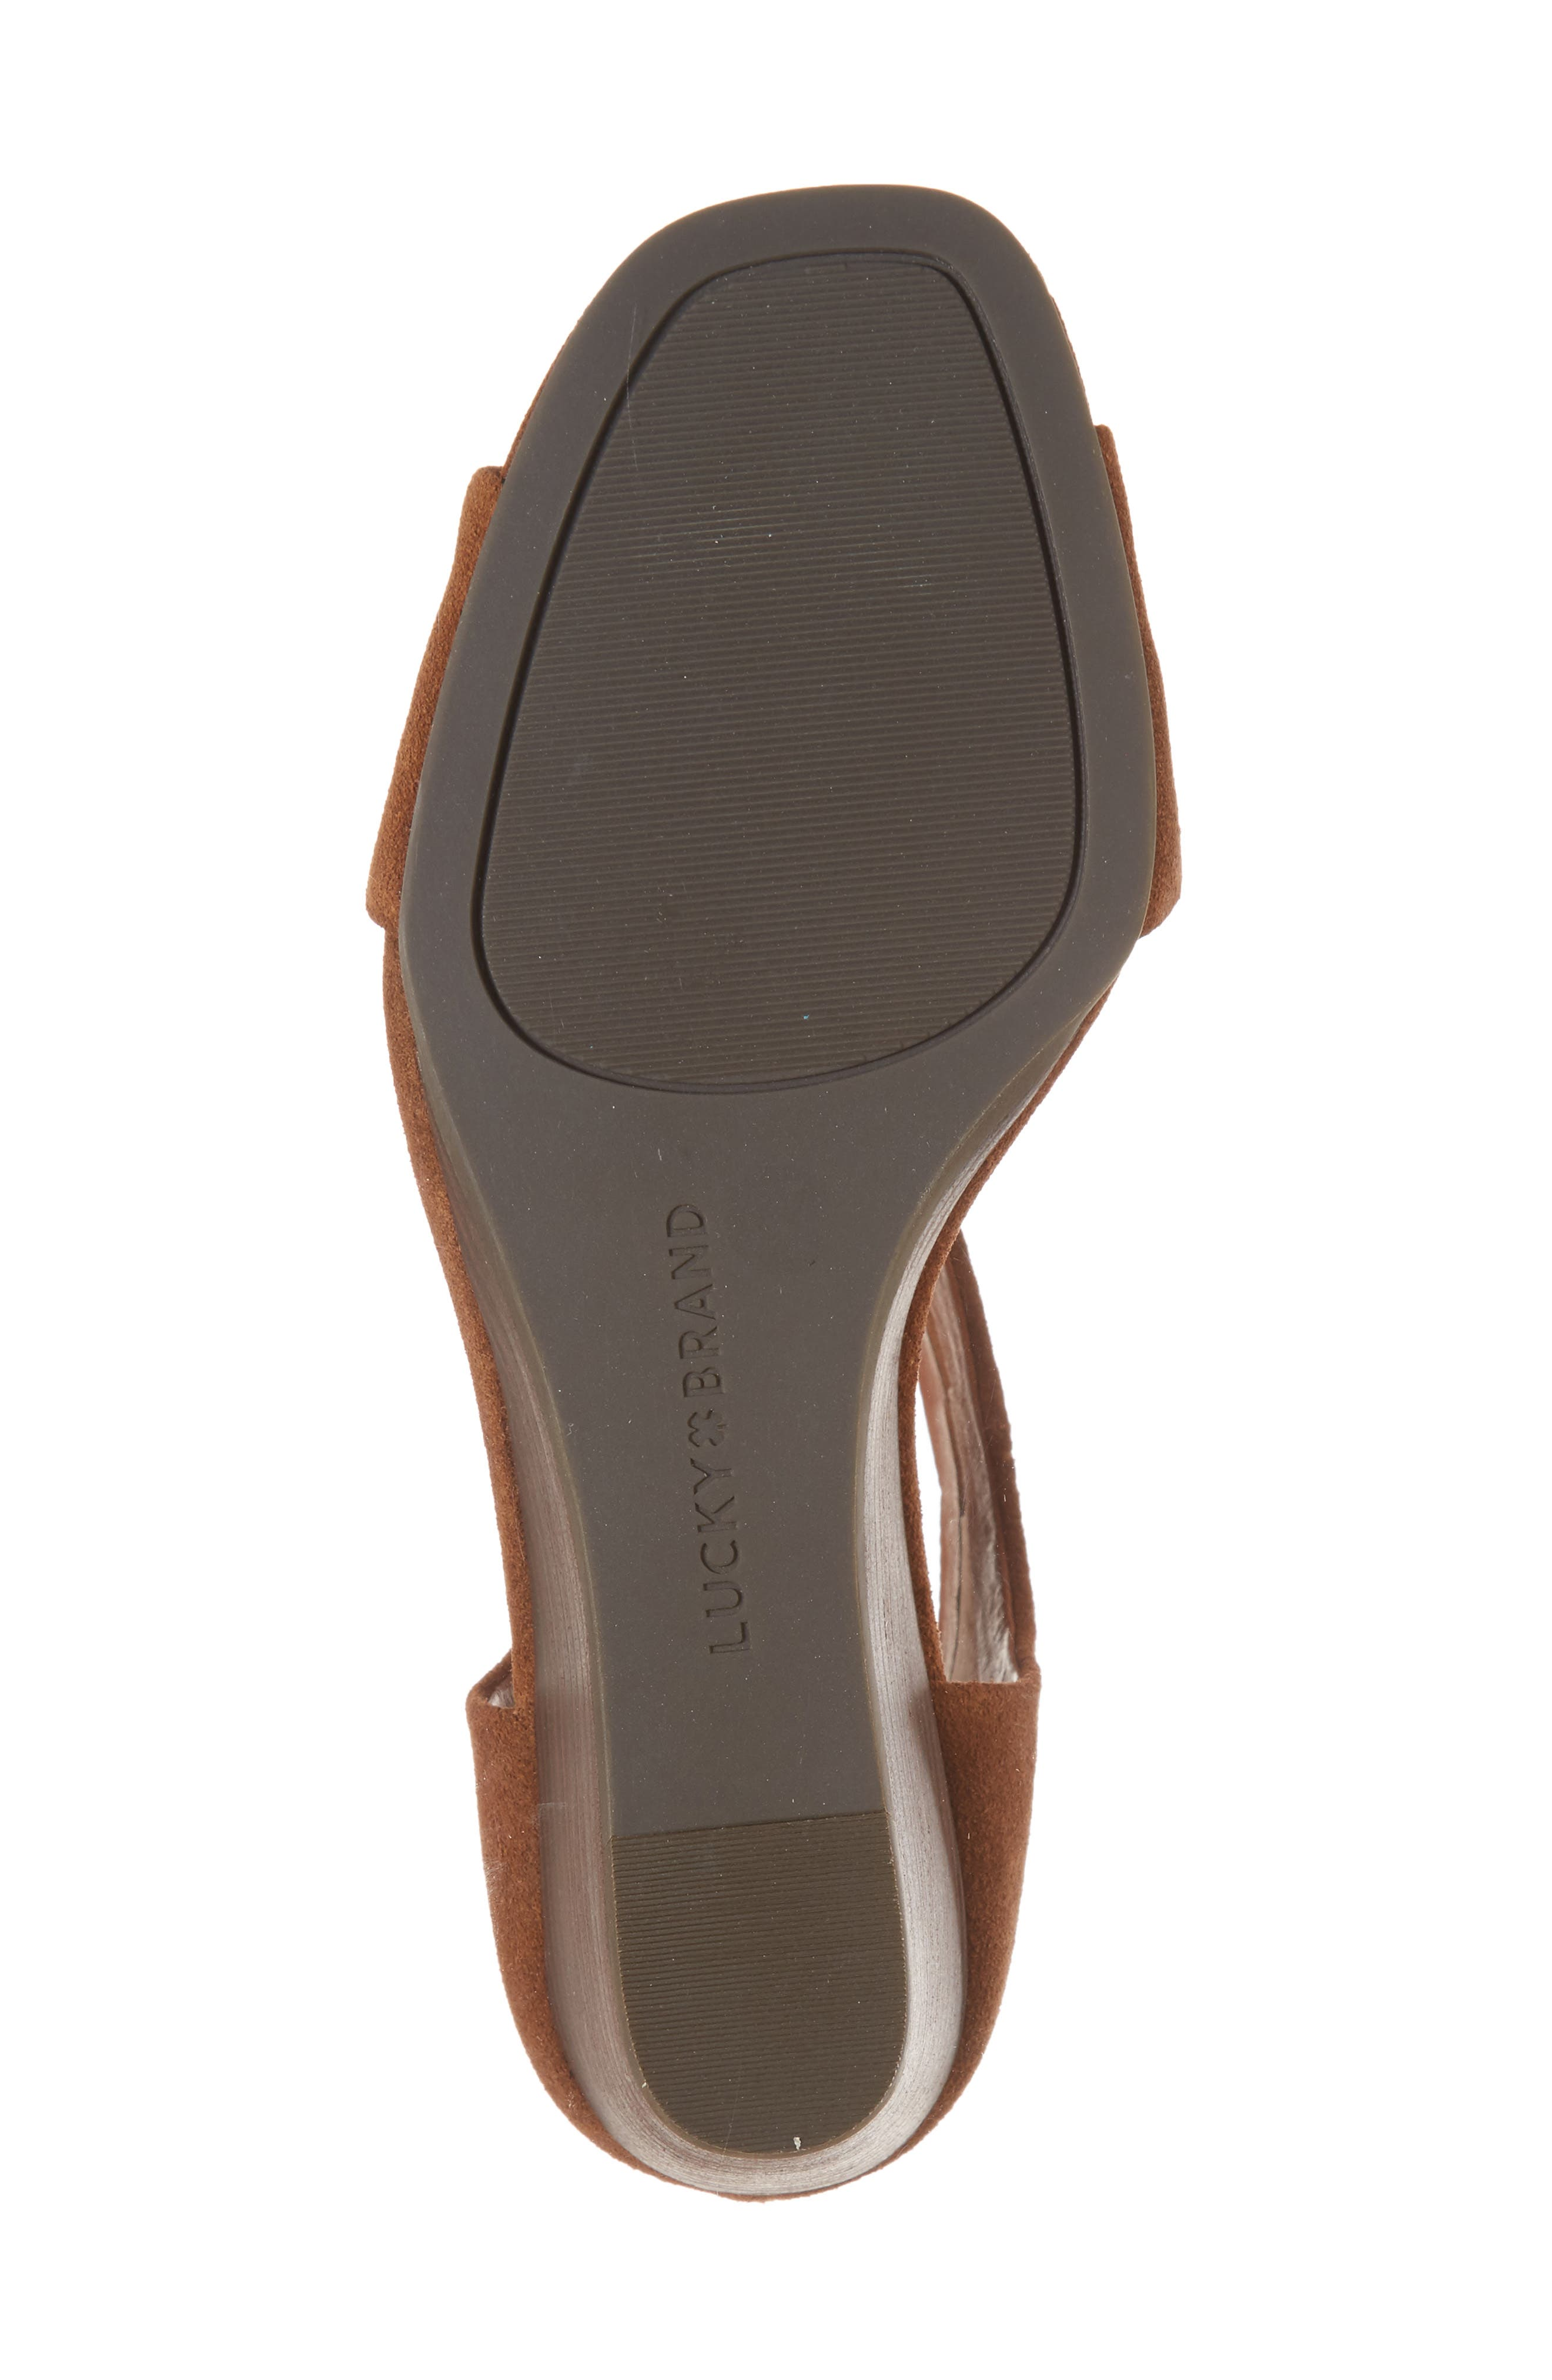 Tehirr Wedge Sandal,                             Alternate thumbnail 6, color,                             Cedar Suede